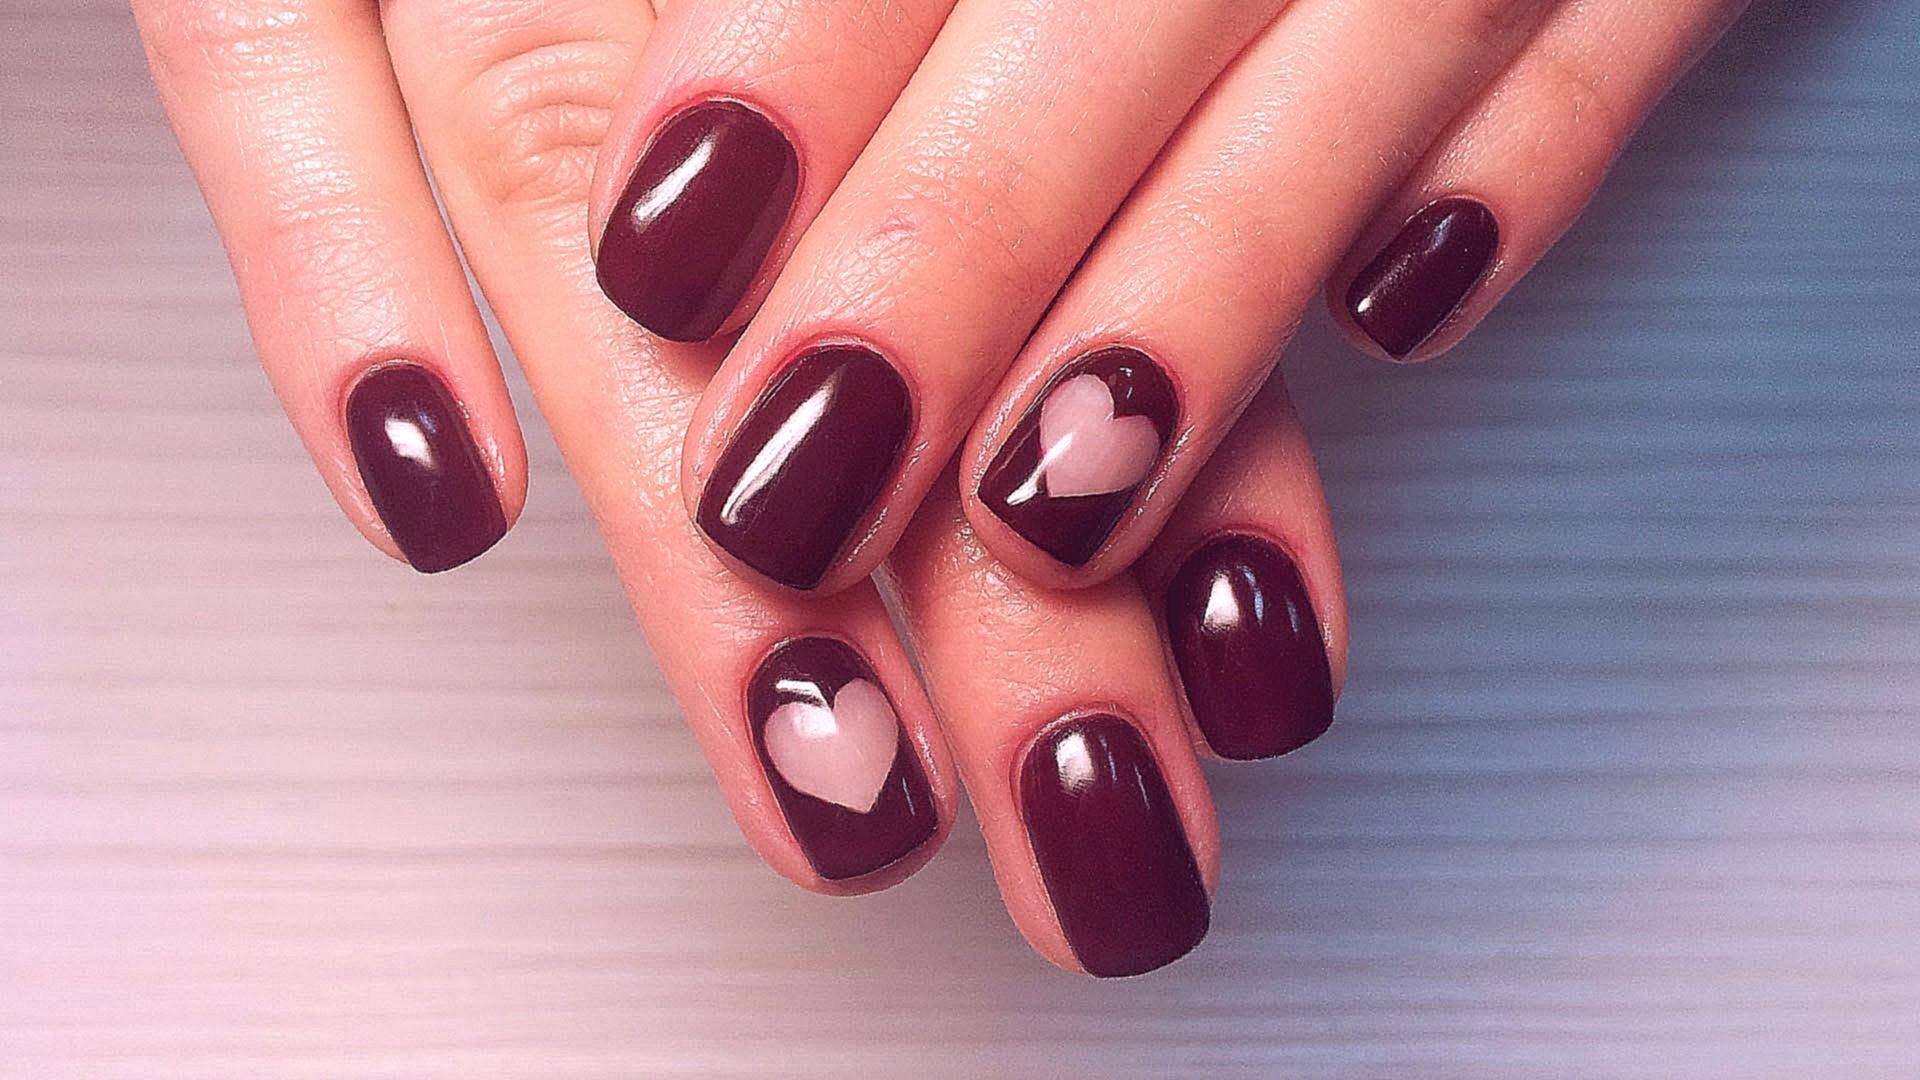 shlak_dlja_nogtej_dizajn_na_korotkie_nogti_foto_1 Красивый маникюр на короткие ногти 2019-2020: фото идеи маникюра на короткие ногти